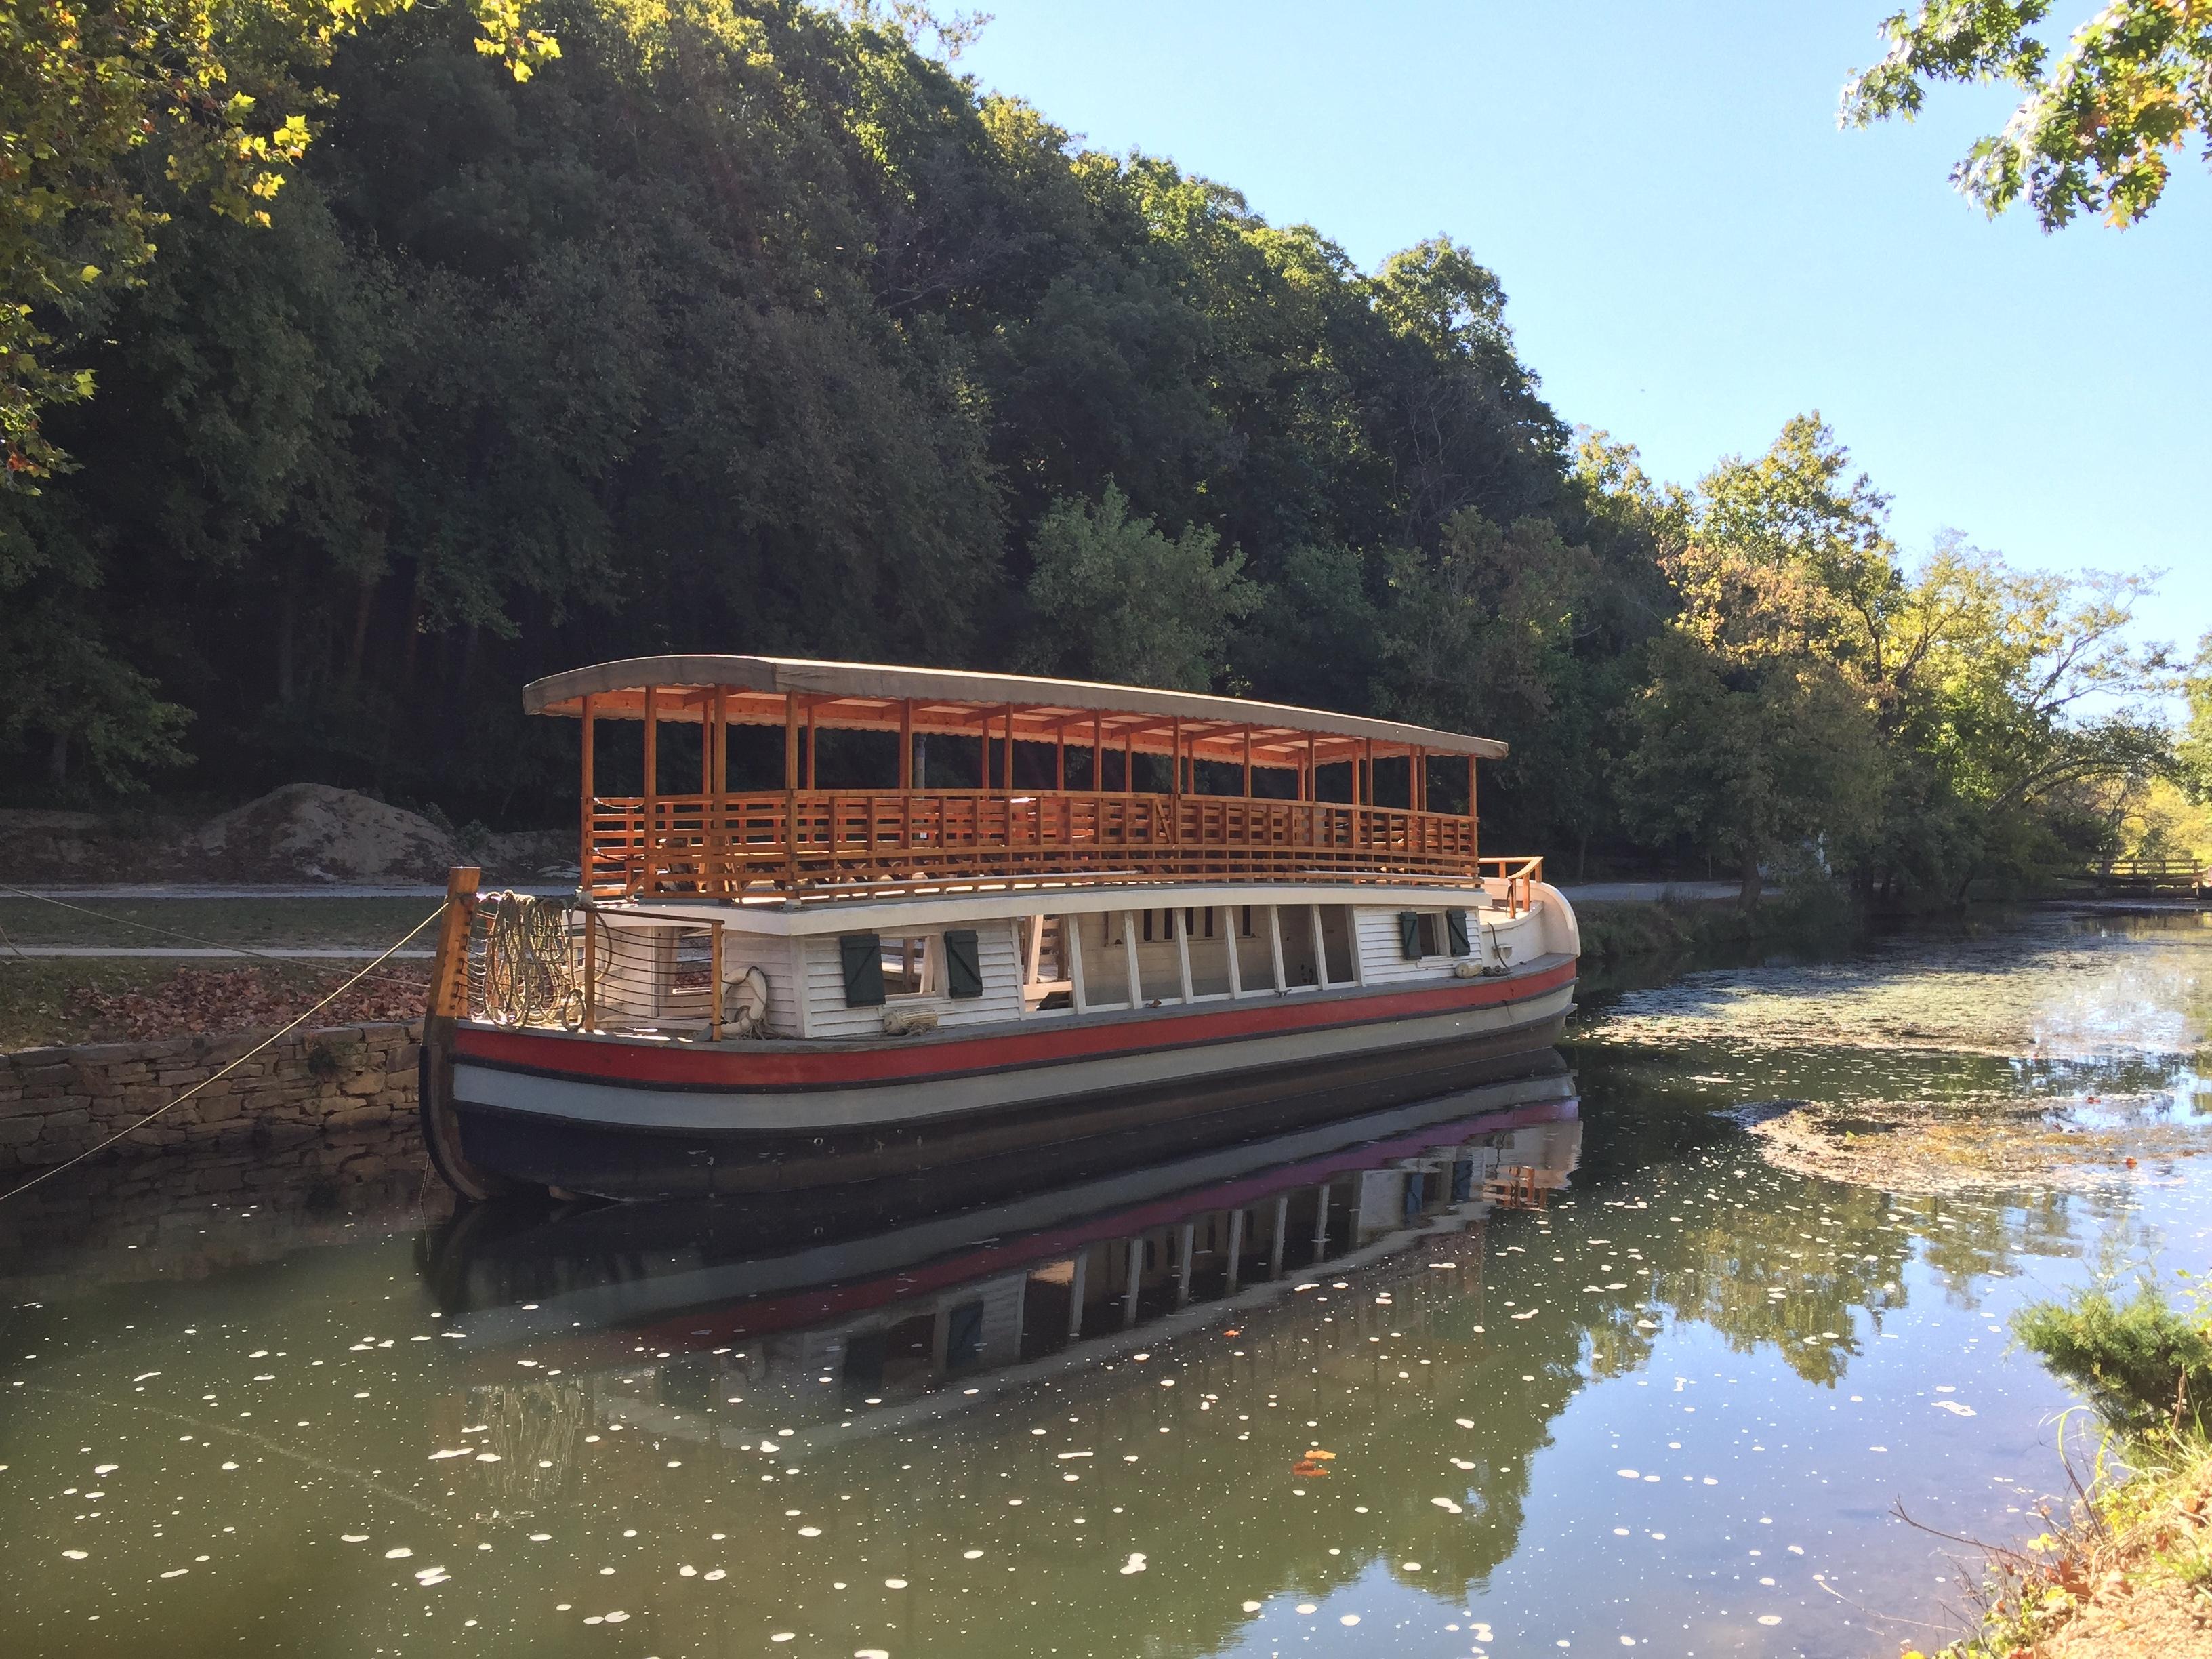 Charles F. Mercer barge on the C&O Canal - Lise Howe